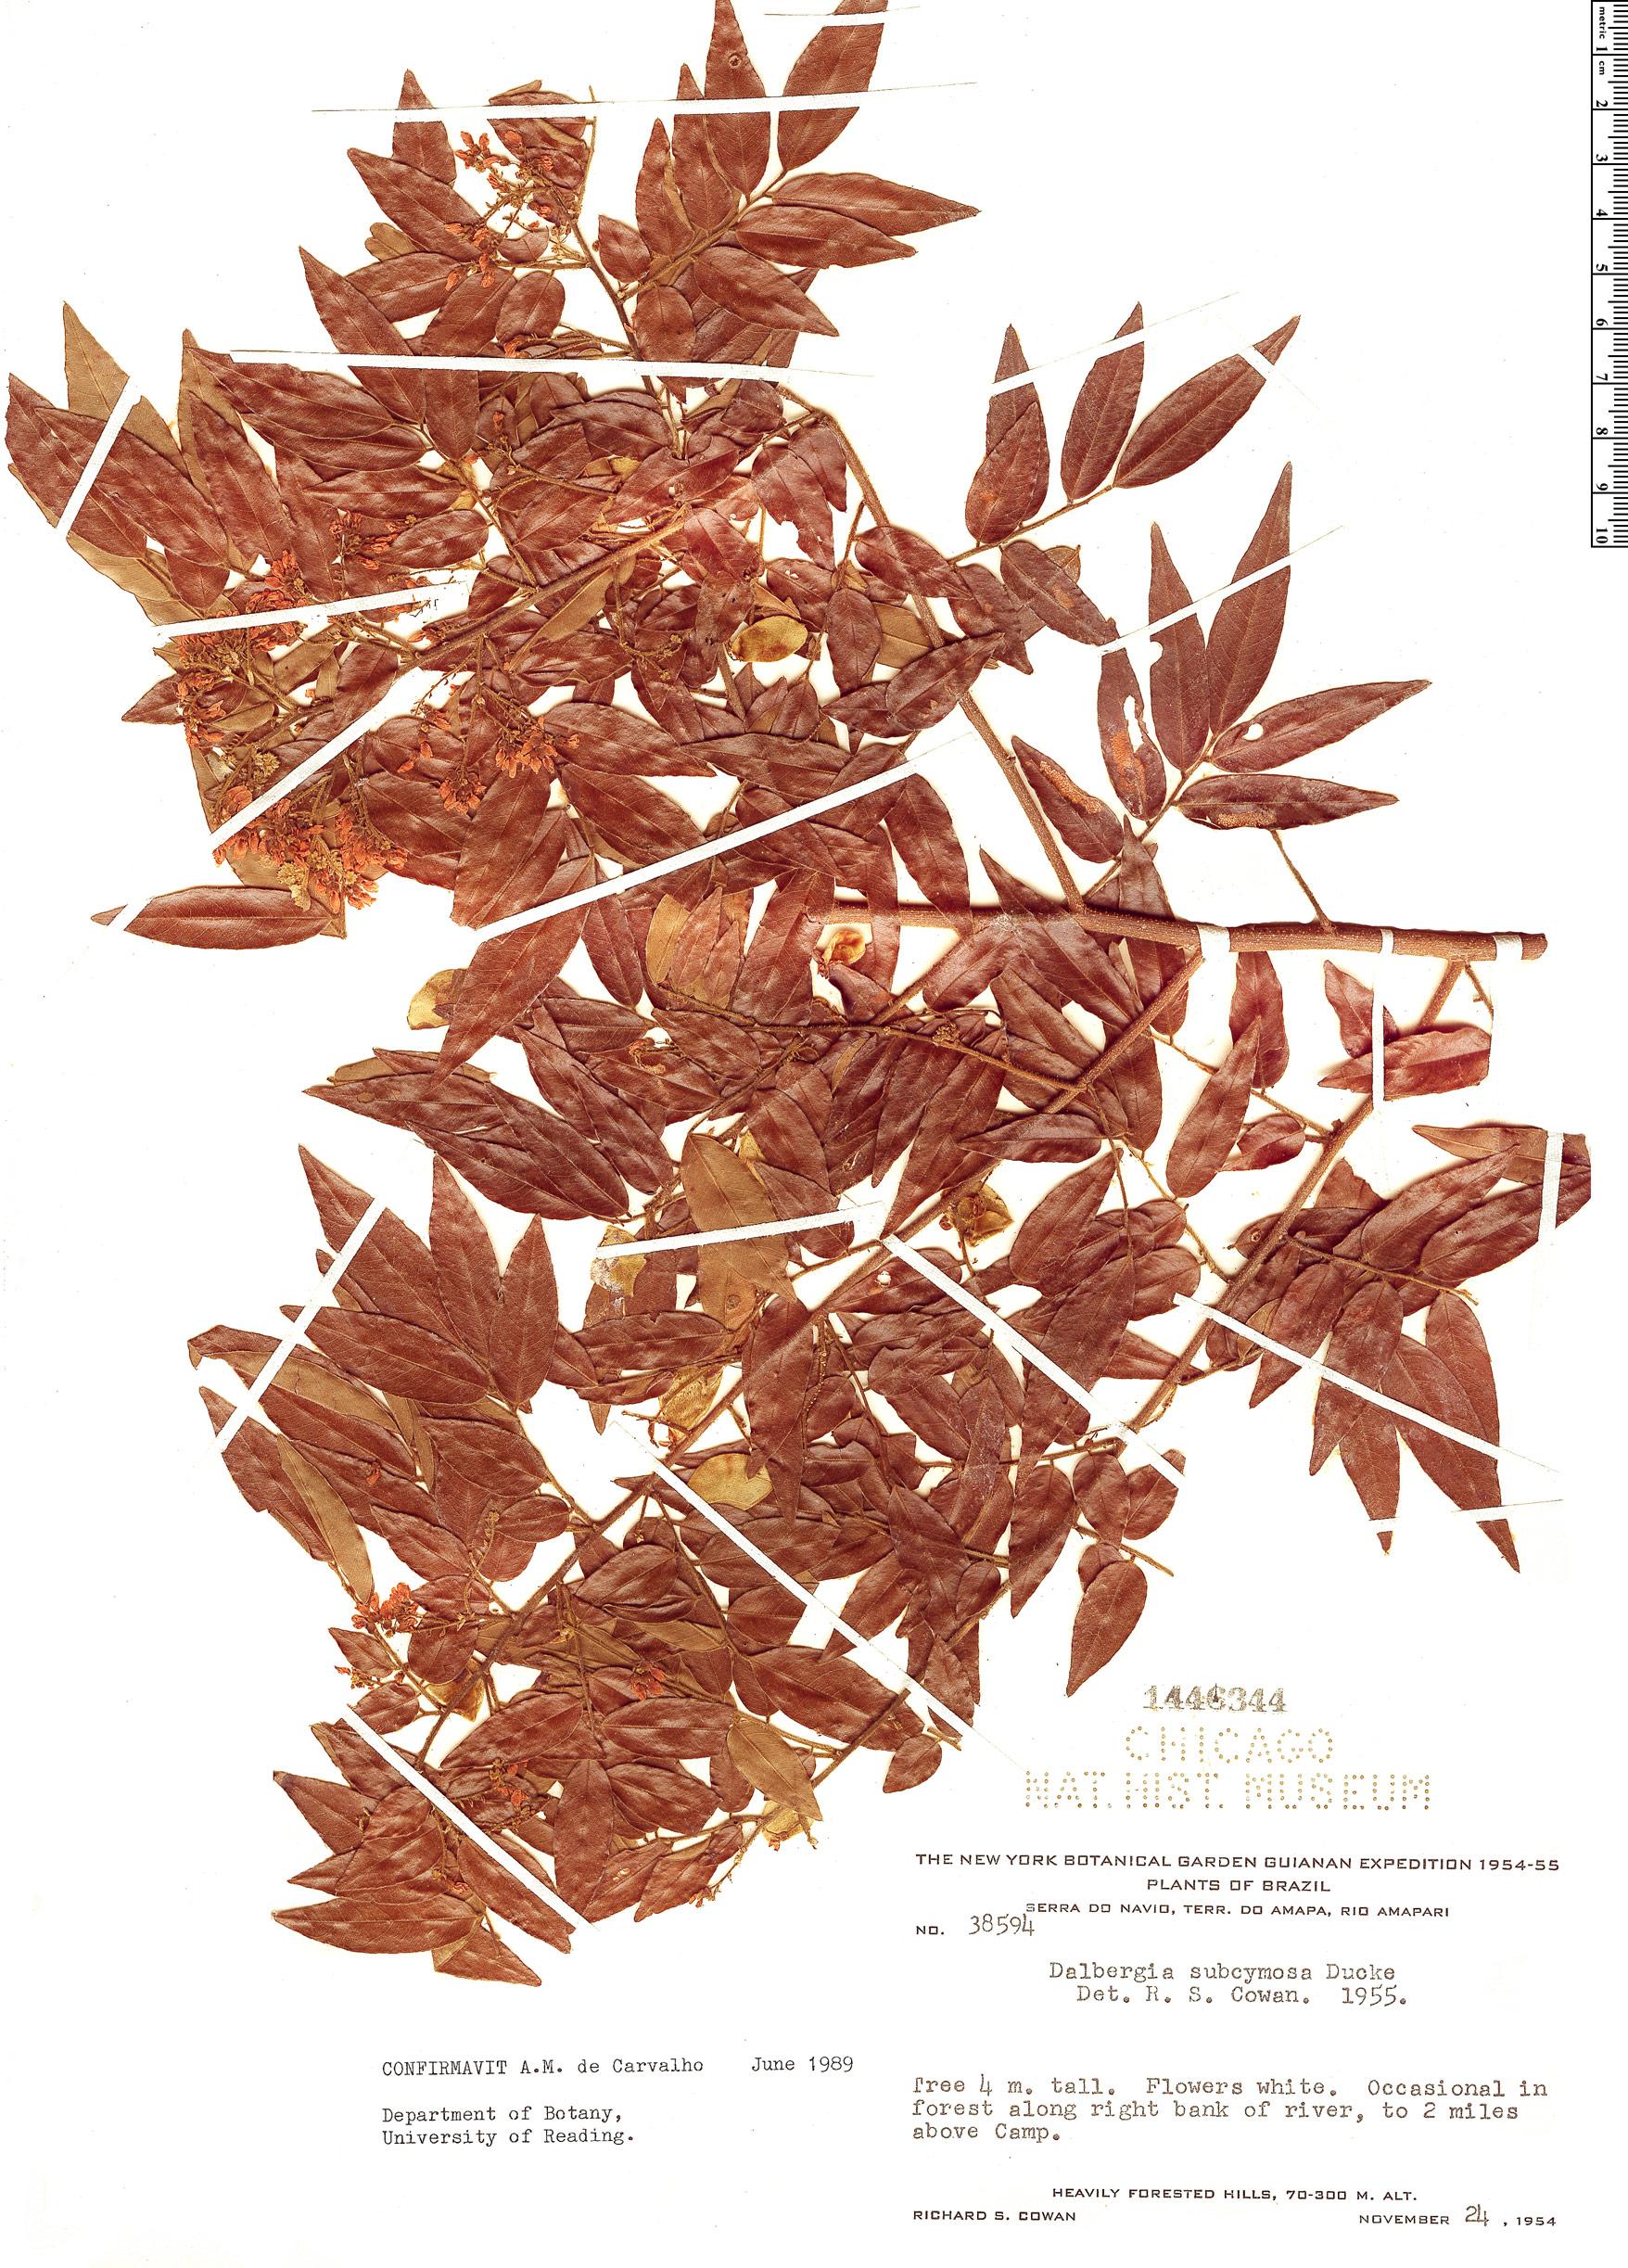 Specimen: Dalbergia subcymosa